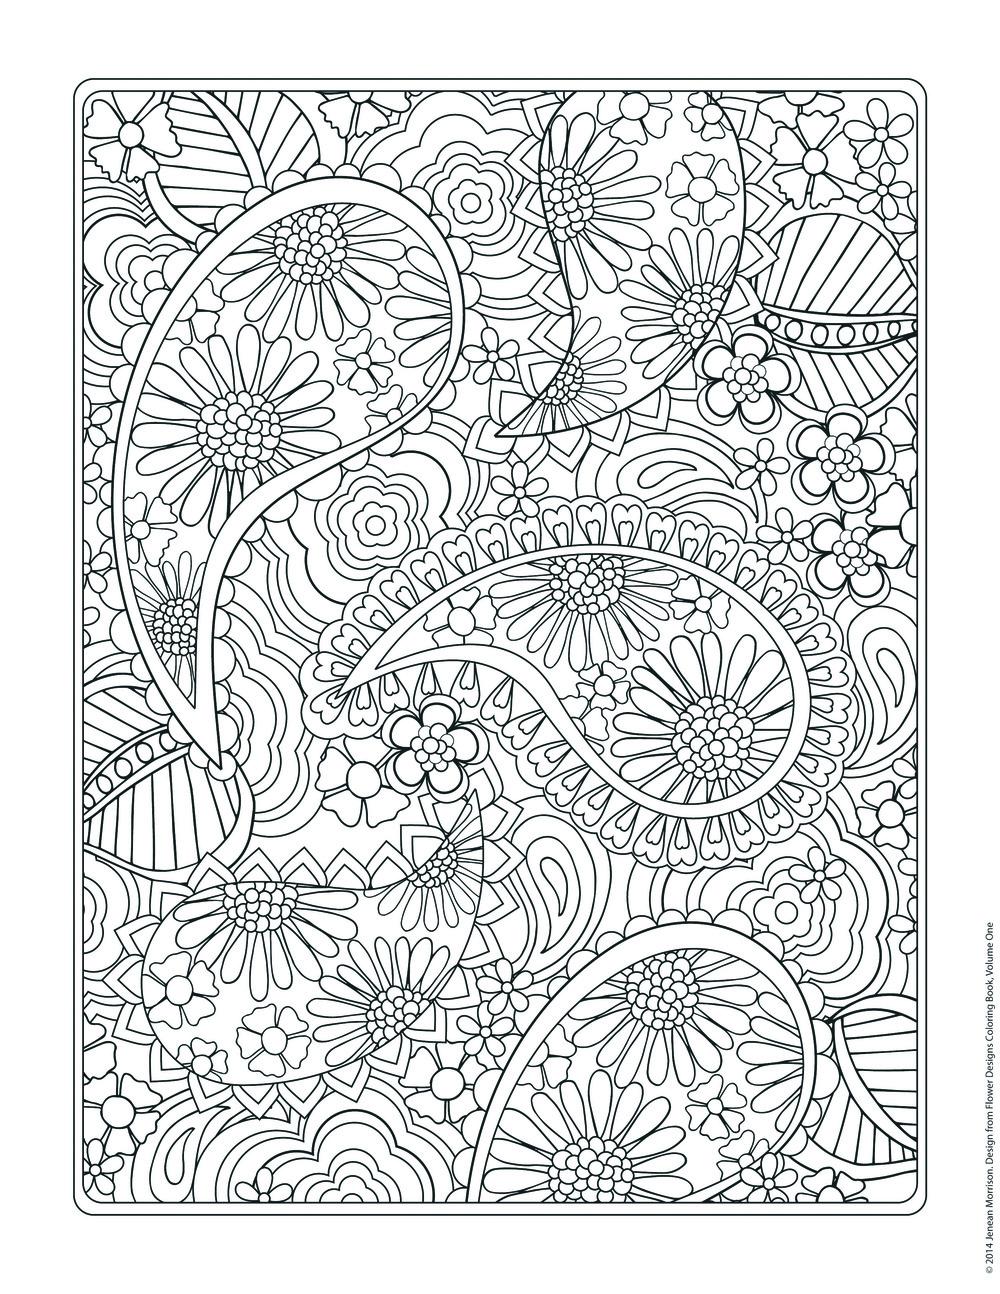 Flower Designs Coloring Book Jenean Morrison Art Design Design Coloring Pages